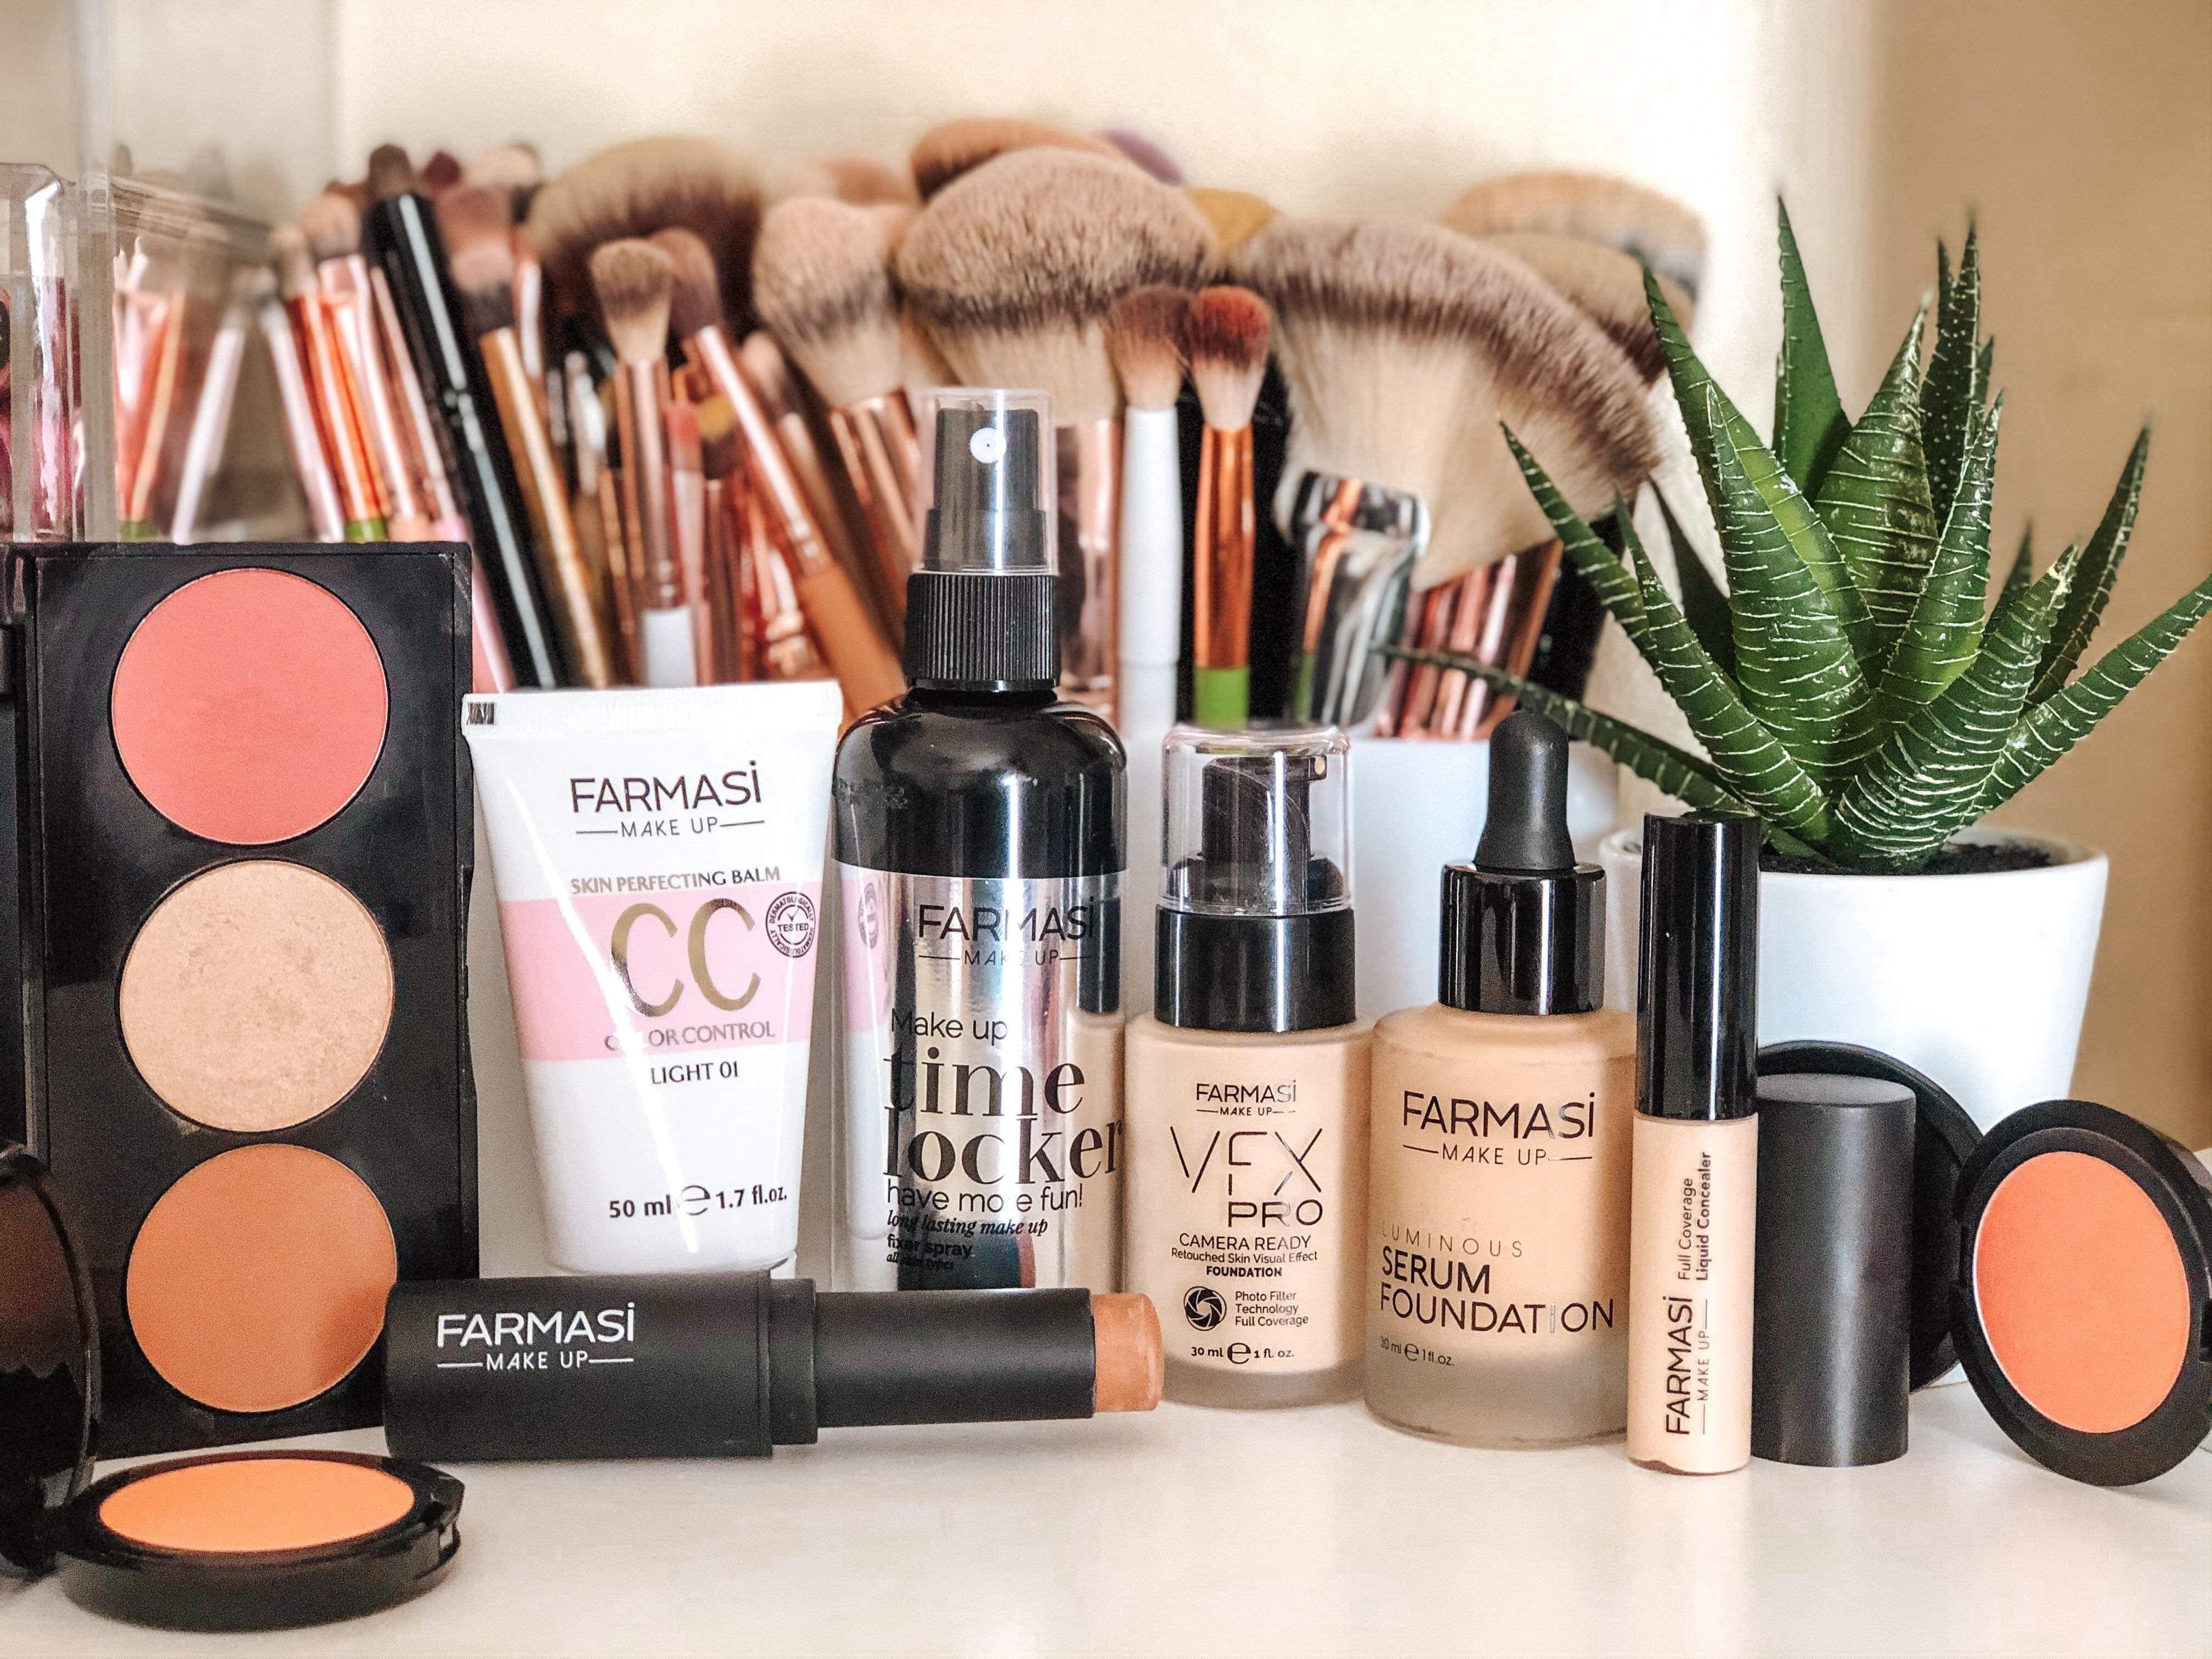 Pin by Kayla Blaich on Farmasi in 2020 Makeup, Eyeshadow